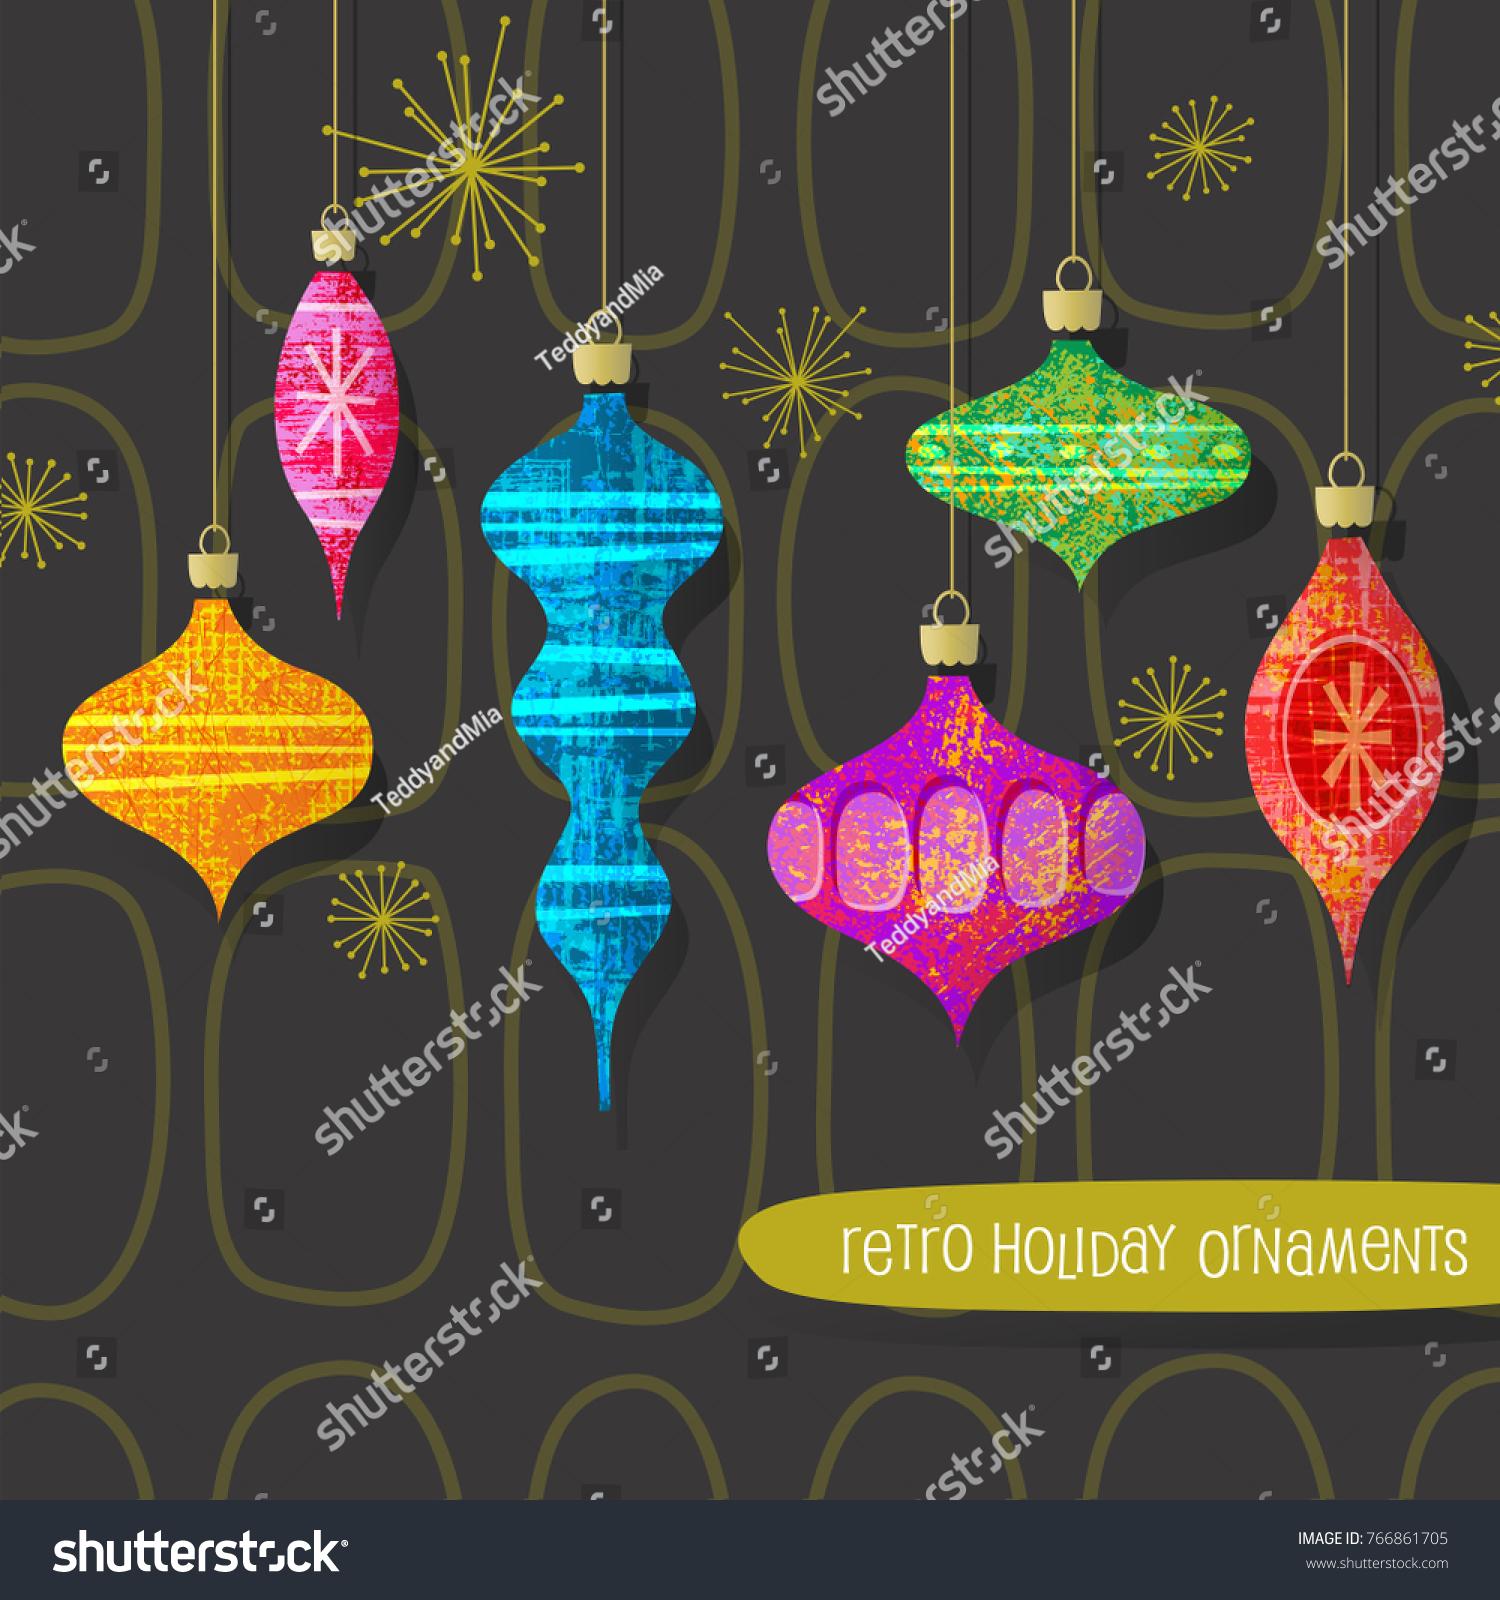 Set Vintage Retro Christmas Ornaments Vector Stock Vector (Royalty ...